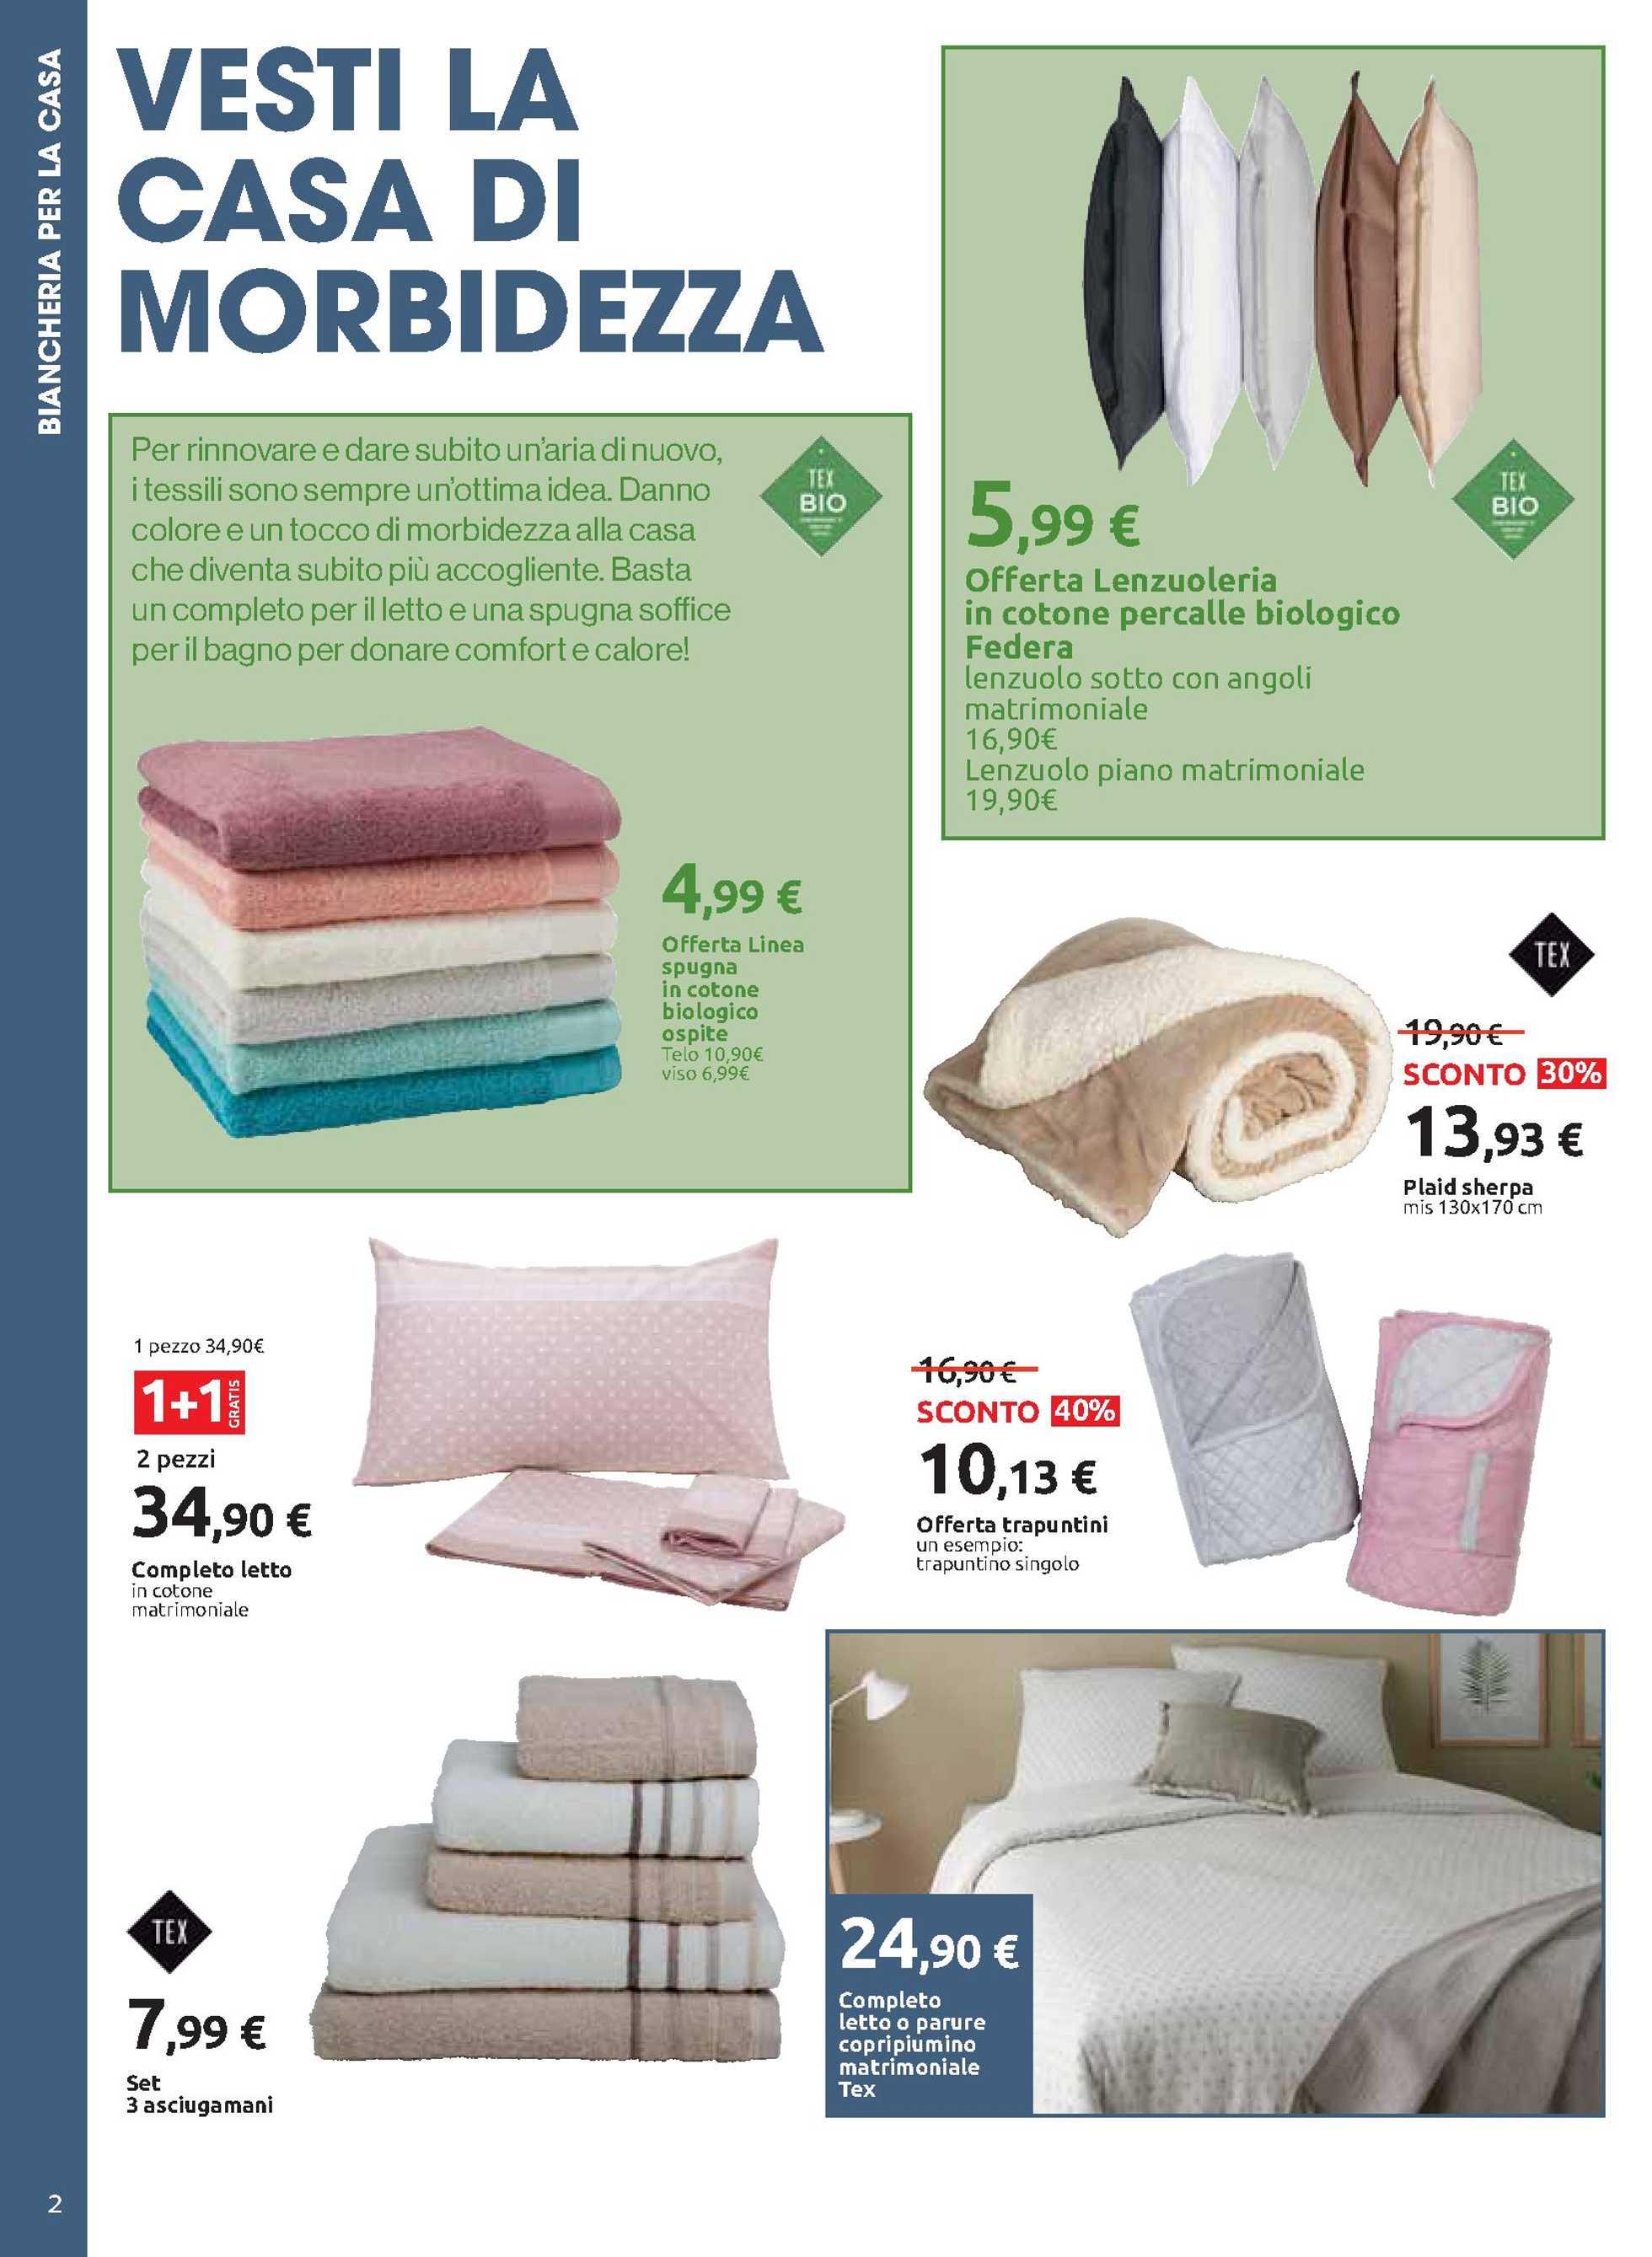 Carrefour Iper - offerte valide dal 02.09.2020 al 24.09.2020 - pagina 2.